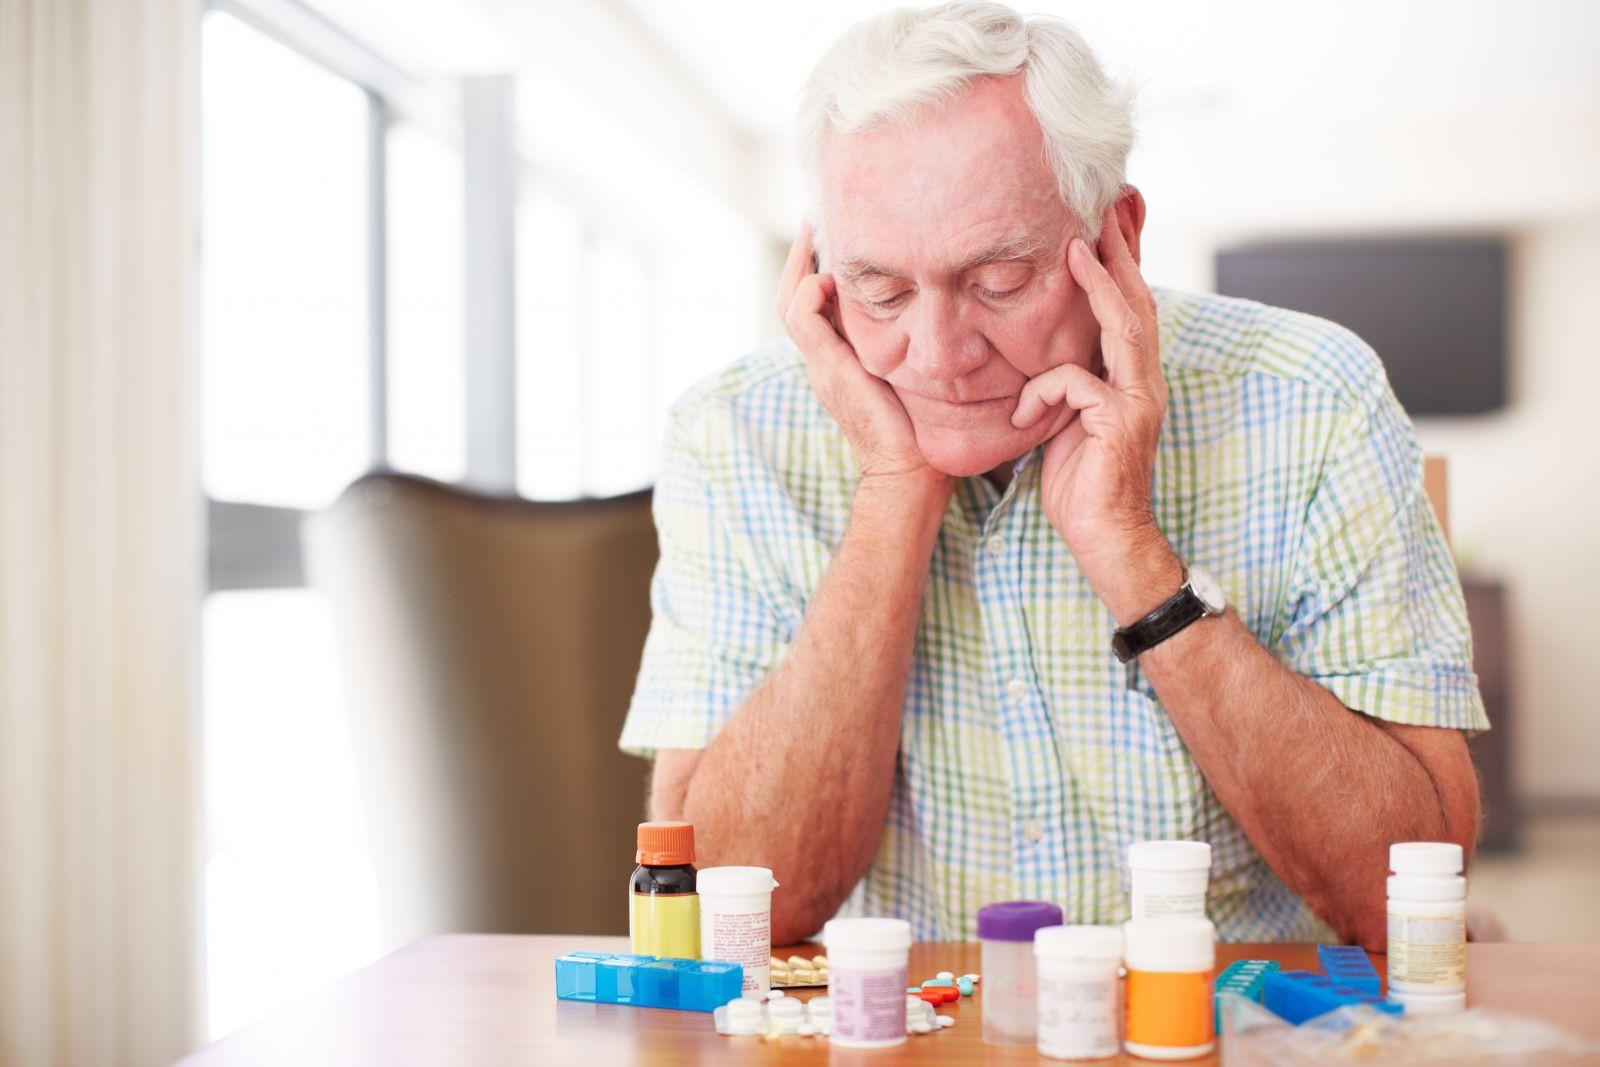 erectile dysfunction drugs, ED pills